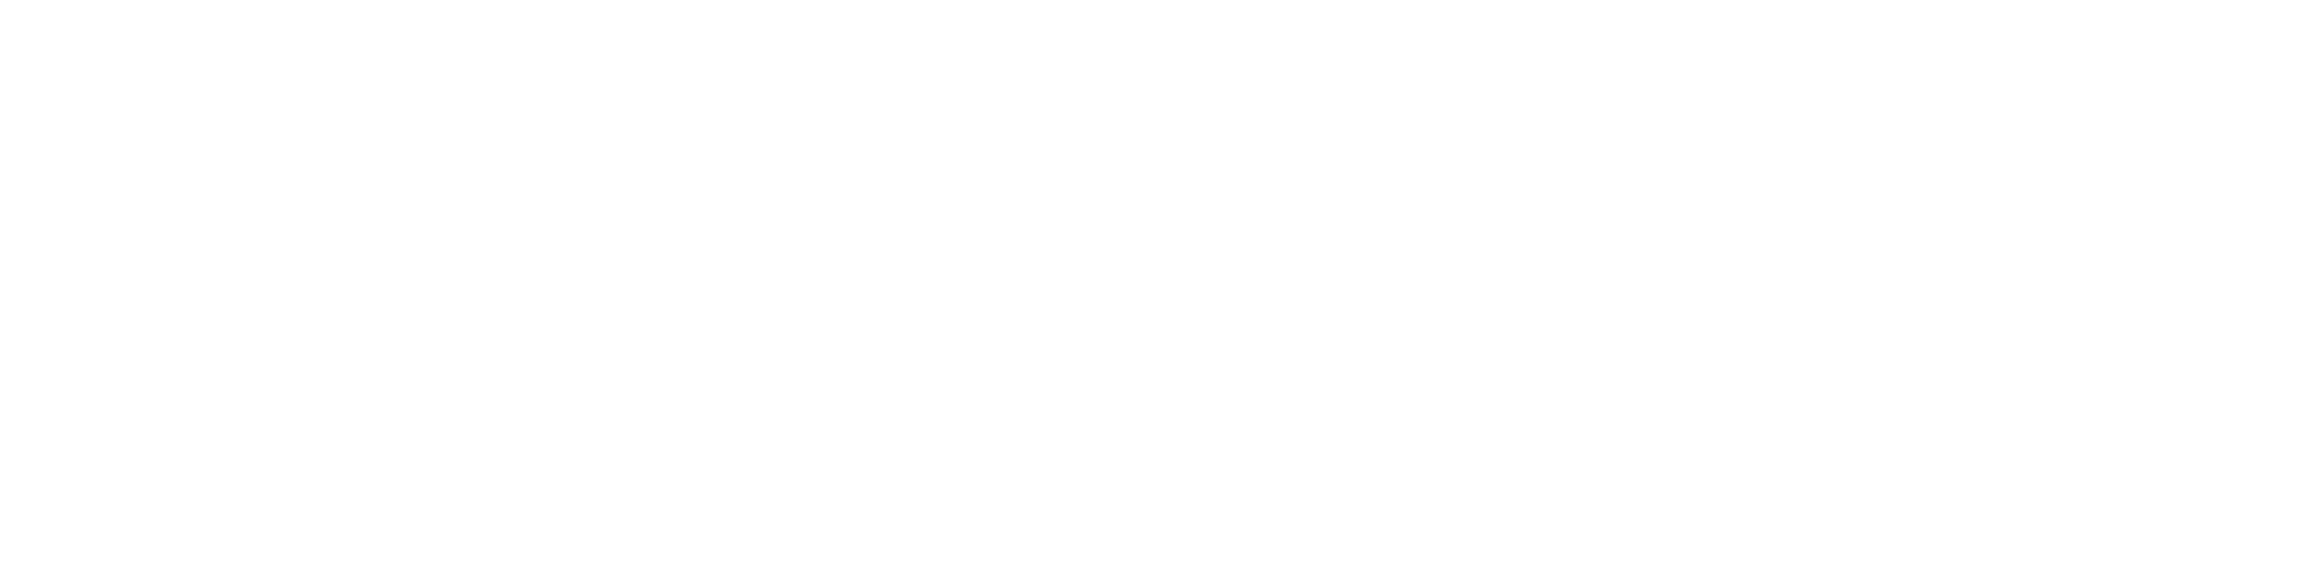 Fonolo Logo_Horizontal All White